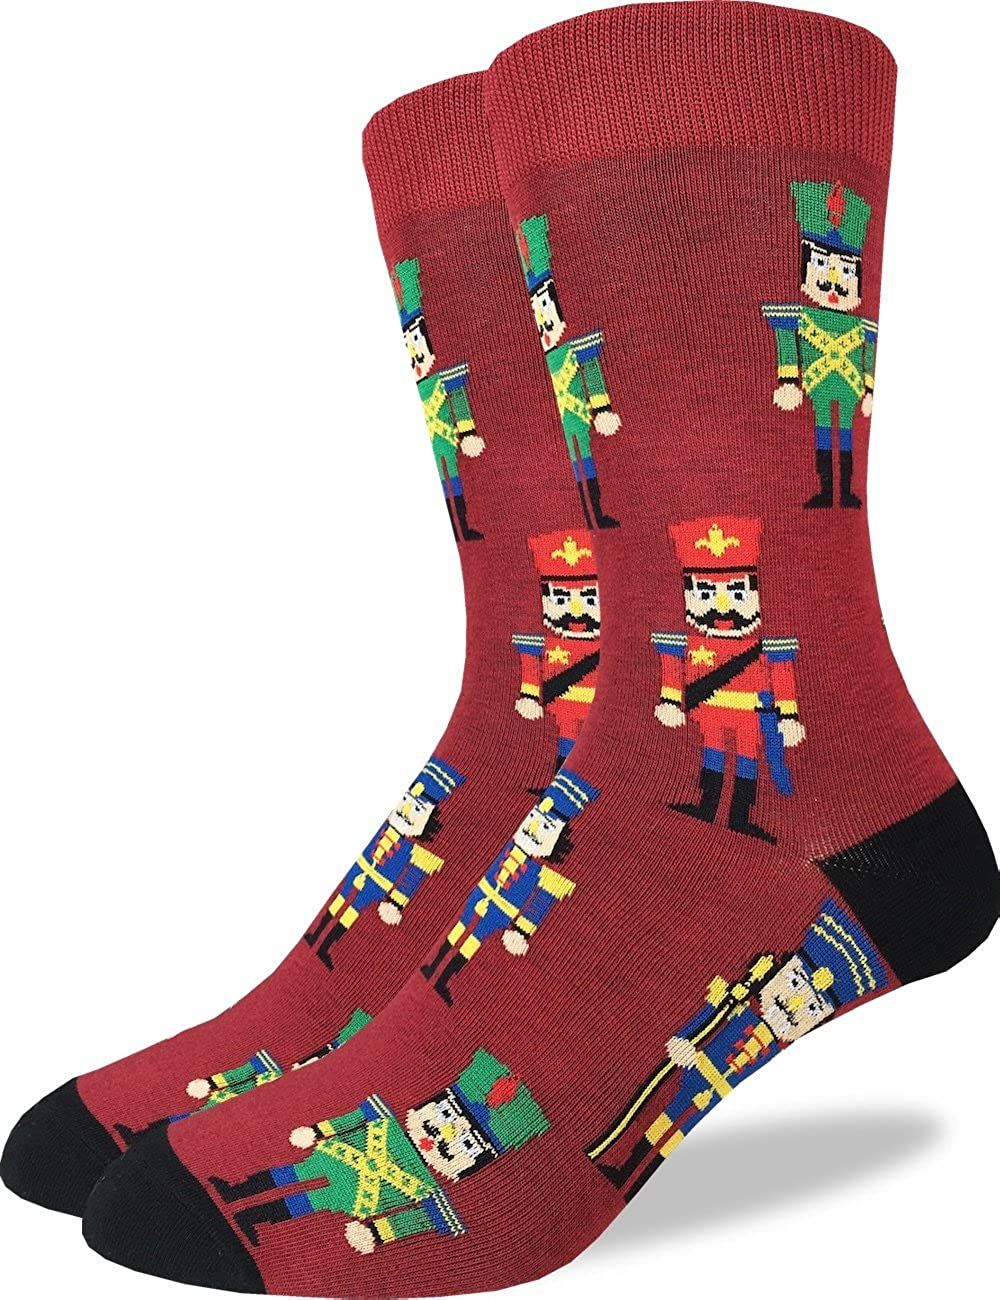 Nutcracker Sock It To Me Men/'s Crew Socks